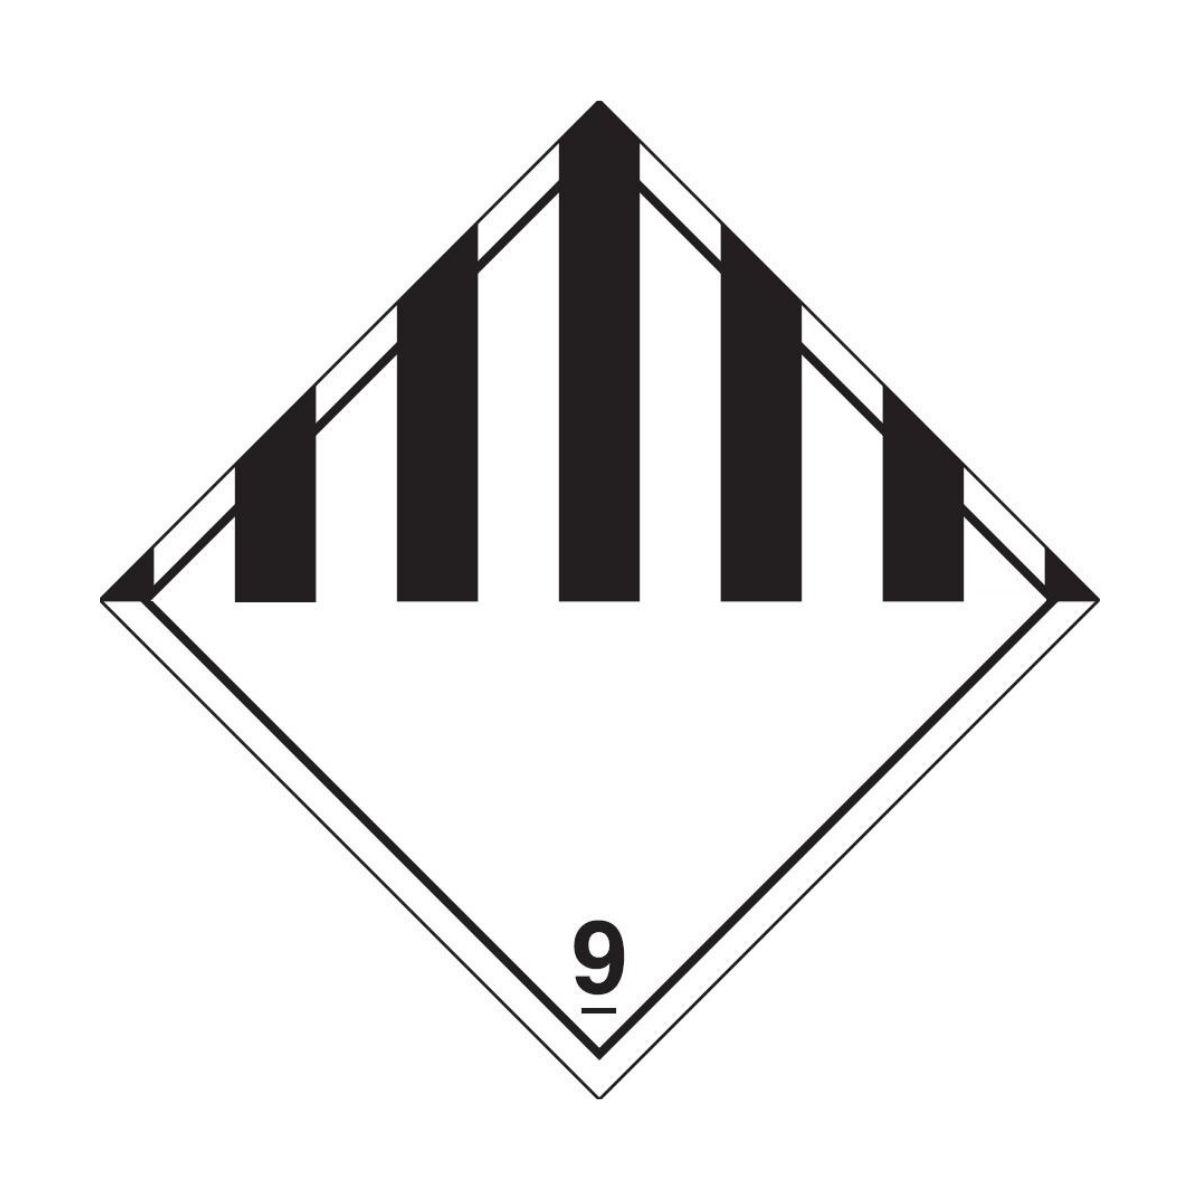 HD2910 UN Hazard Warning Diamond S_A Class 9 Miscellaneous